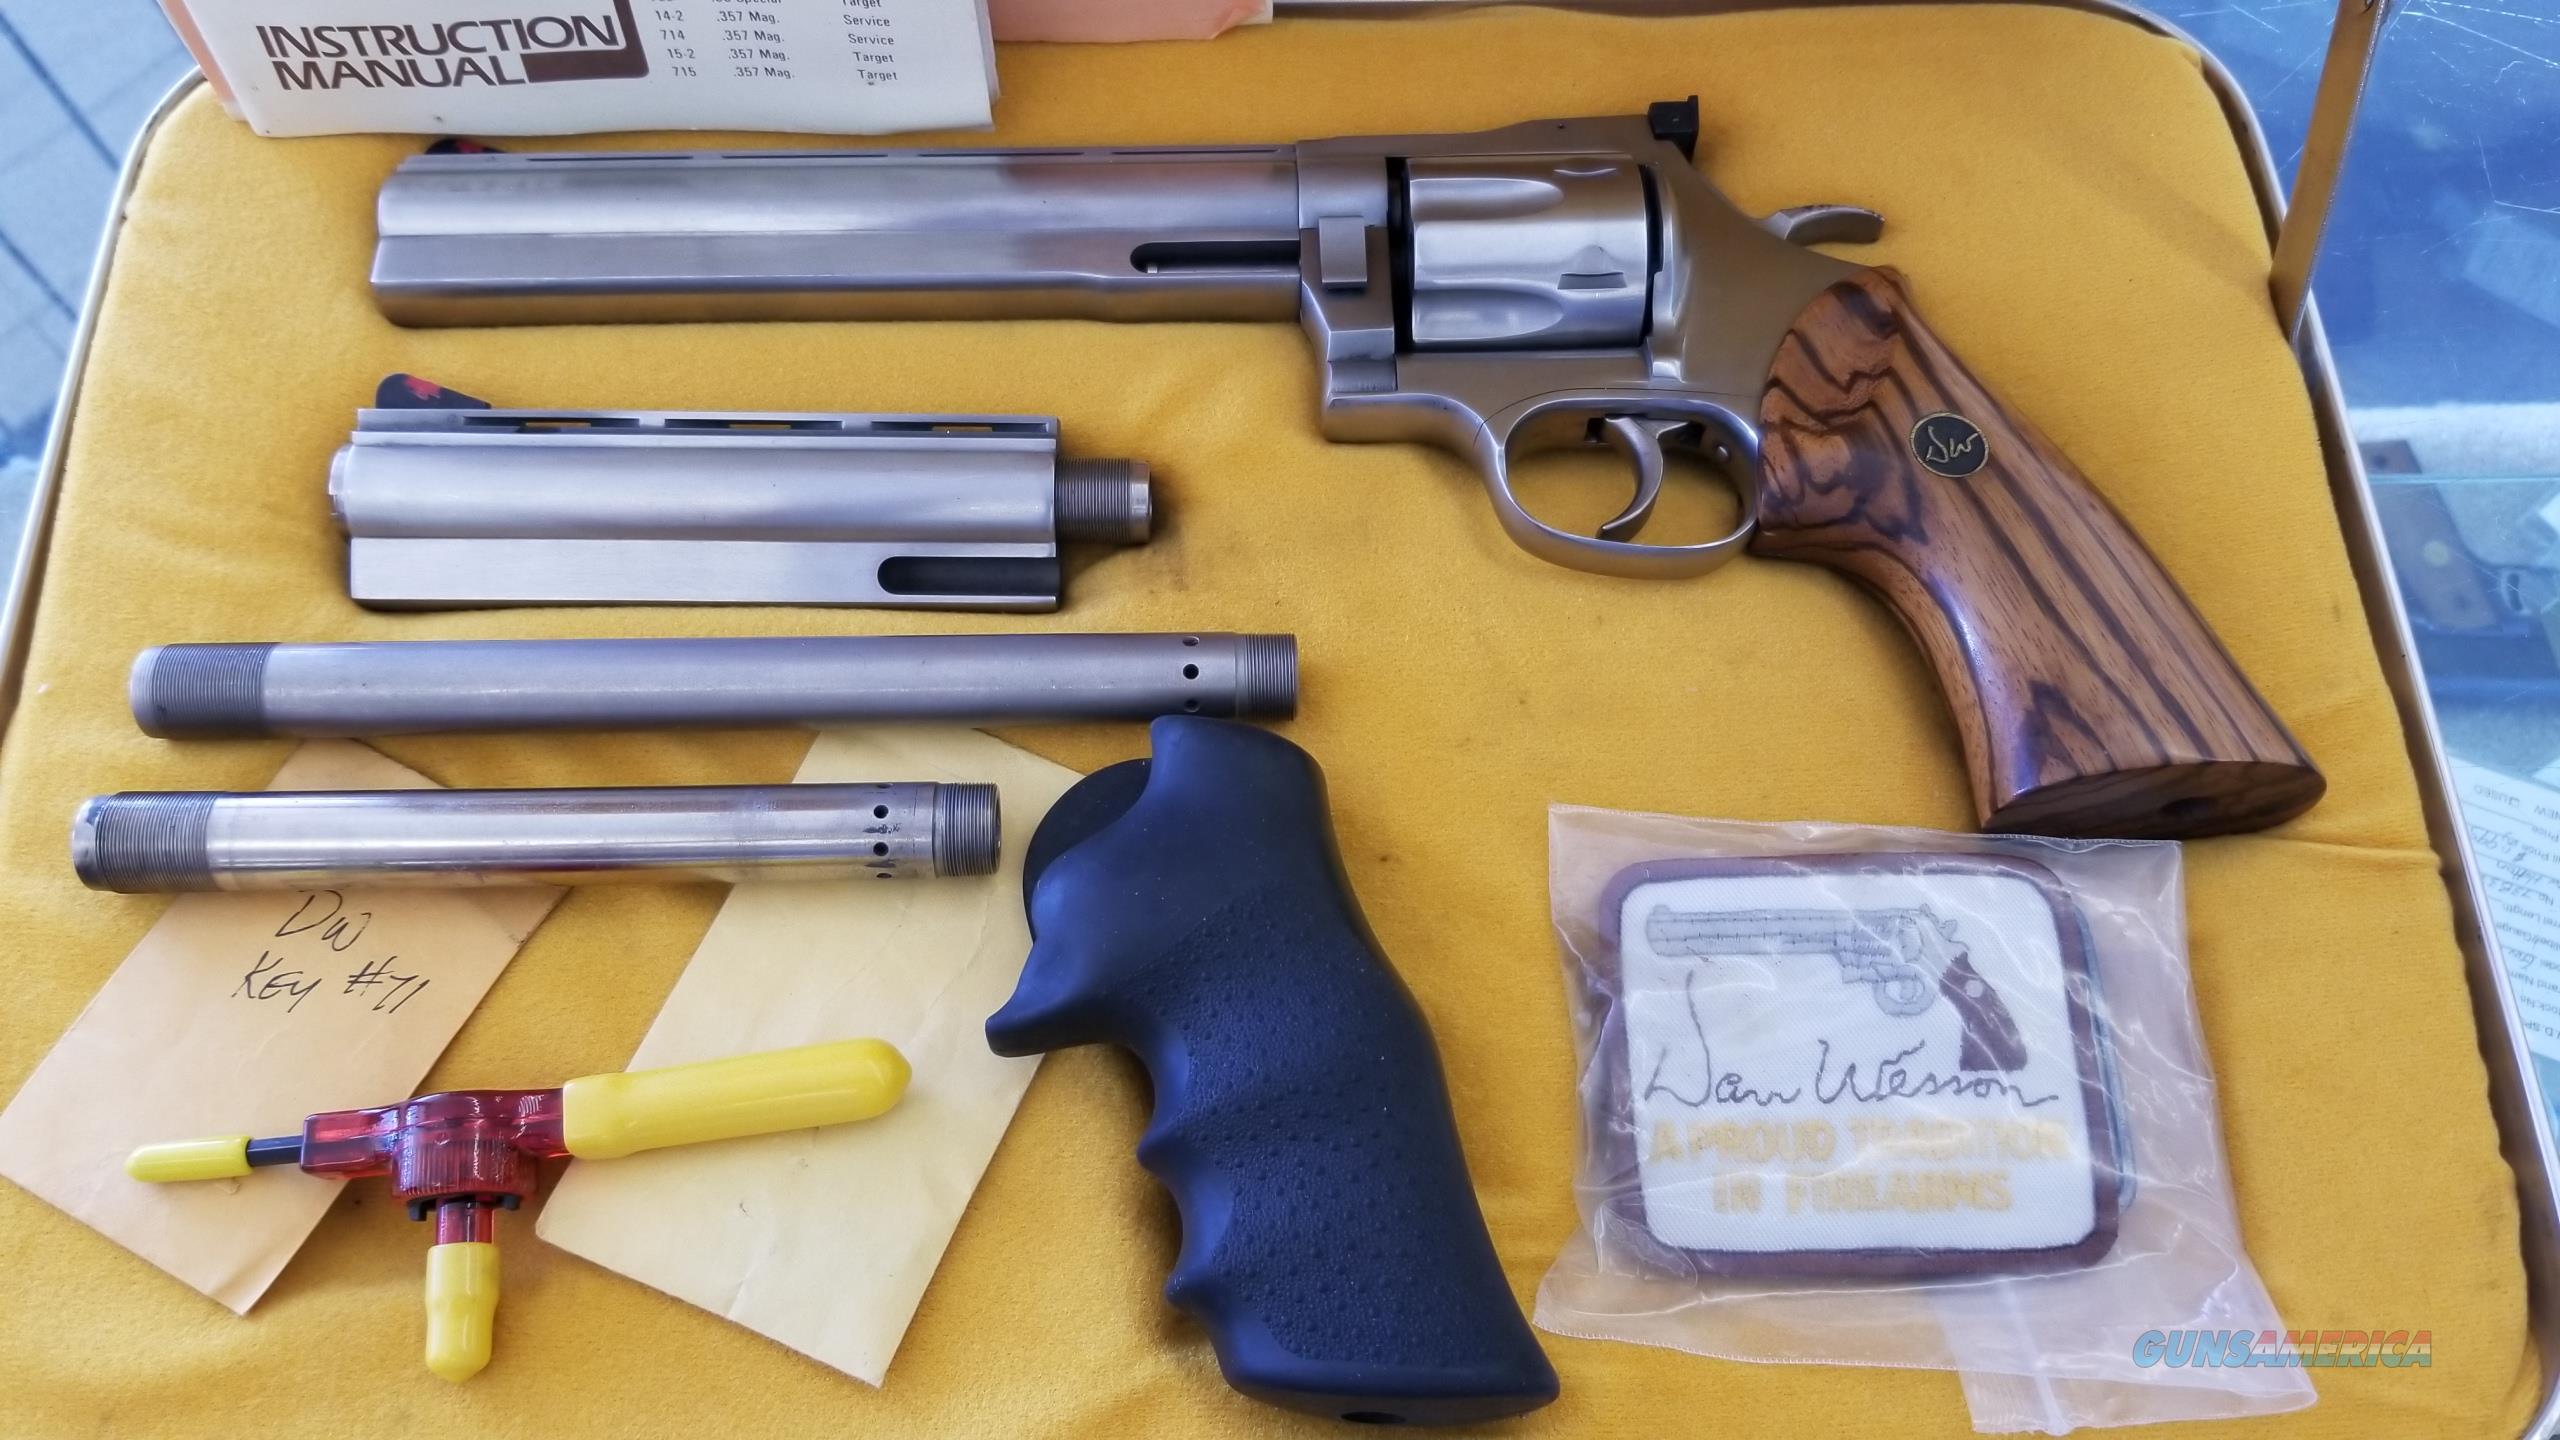 "Pre Owned Dan Wesson Model 744 Pistol Pack w/ Extra Barrels (6"" and 8"") w/ Case  Guns > Pistols > Dan Wesson Pistols/Revolvers > Revolvers"